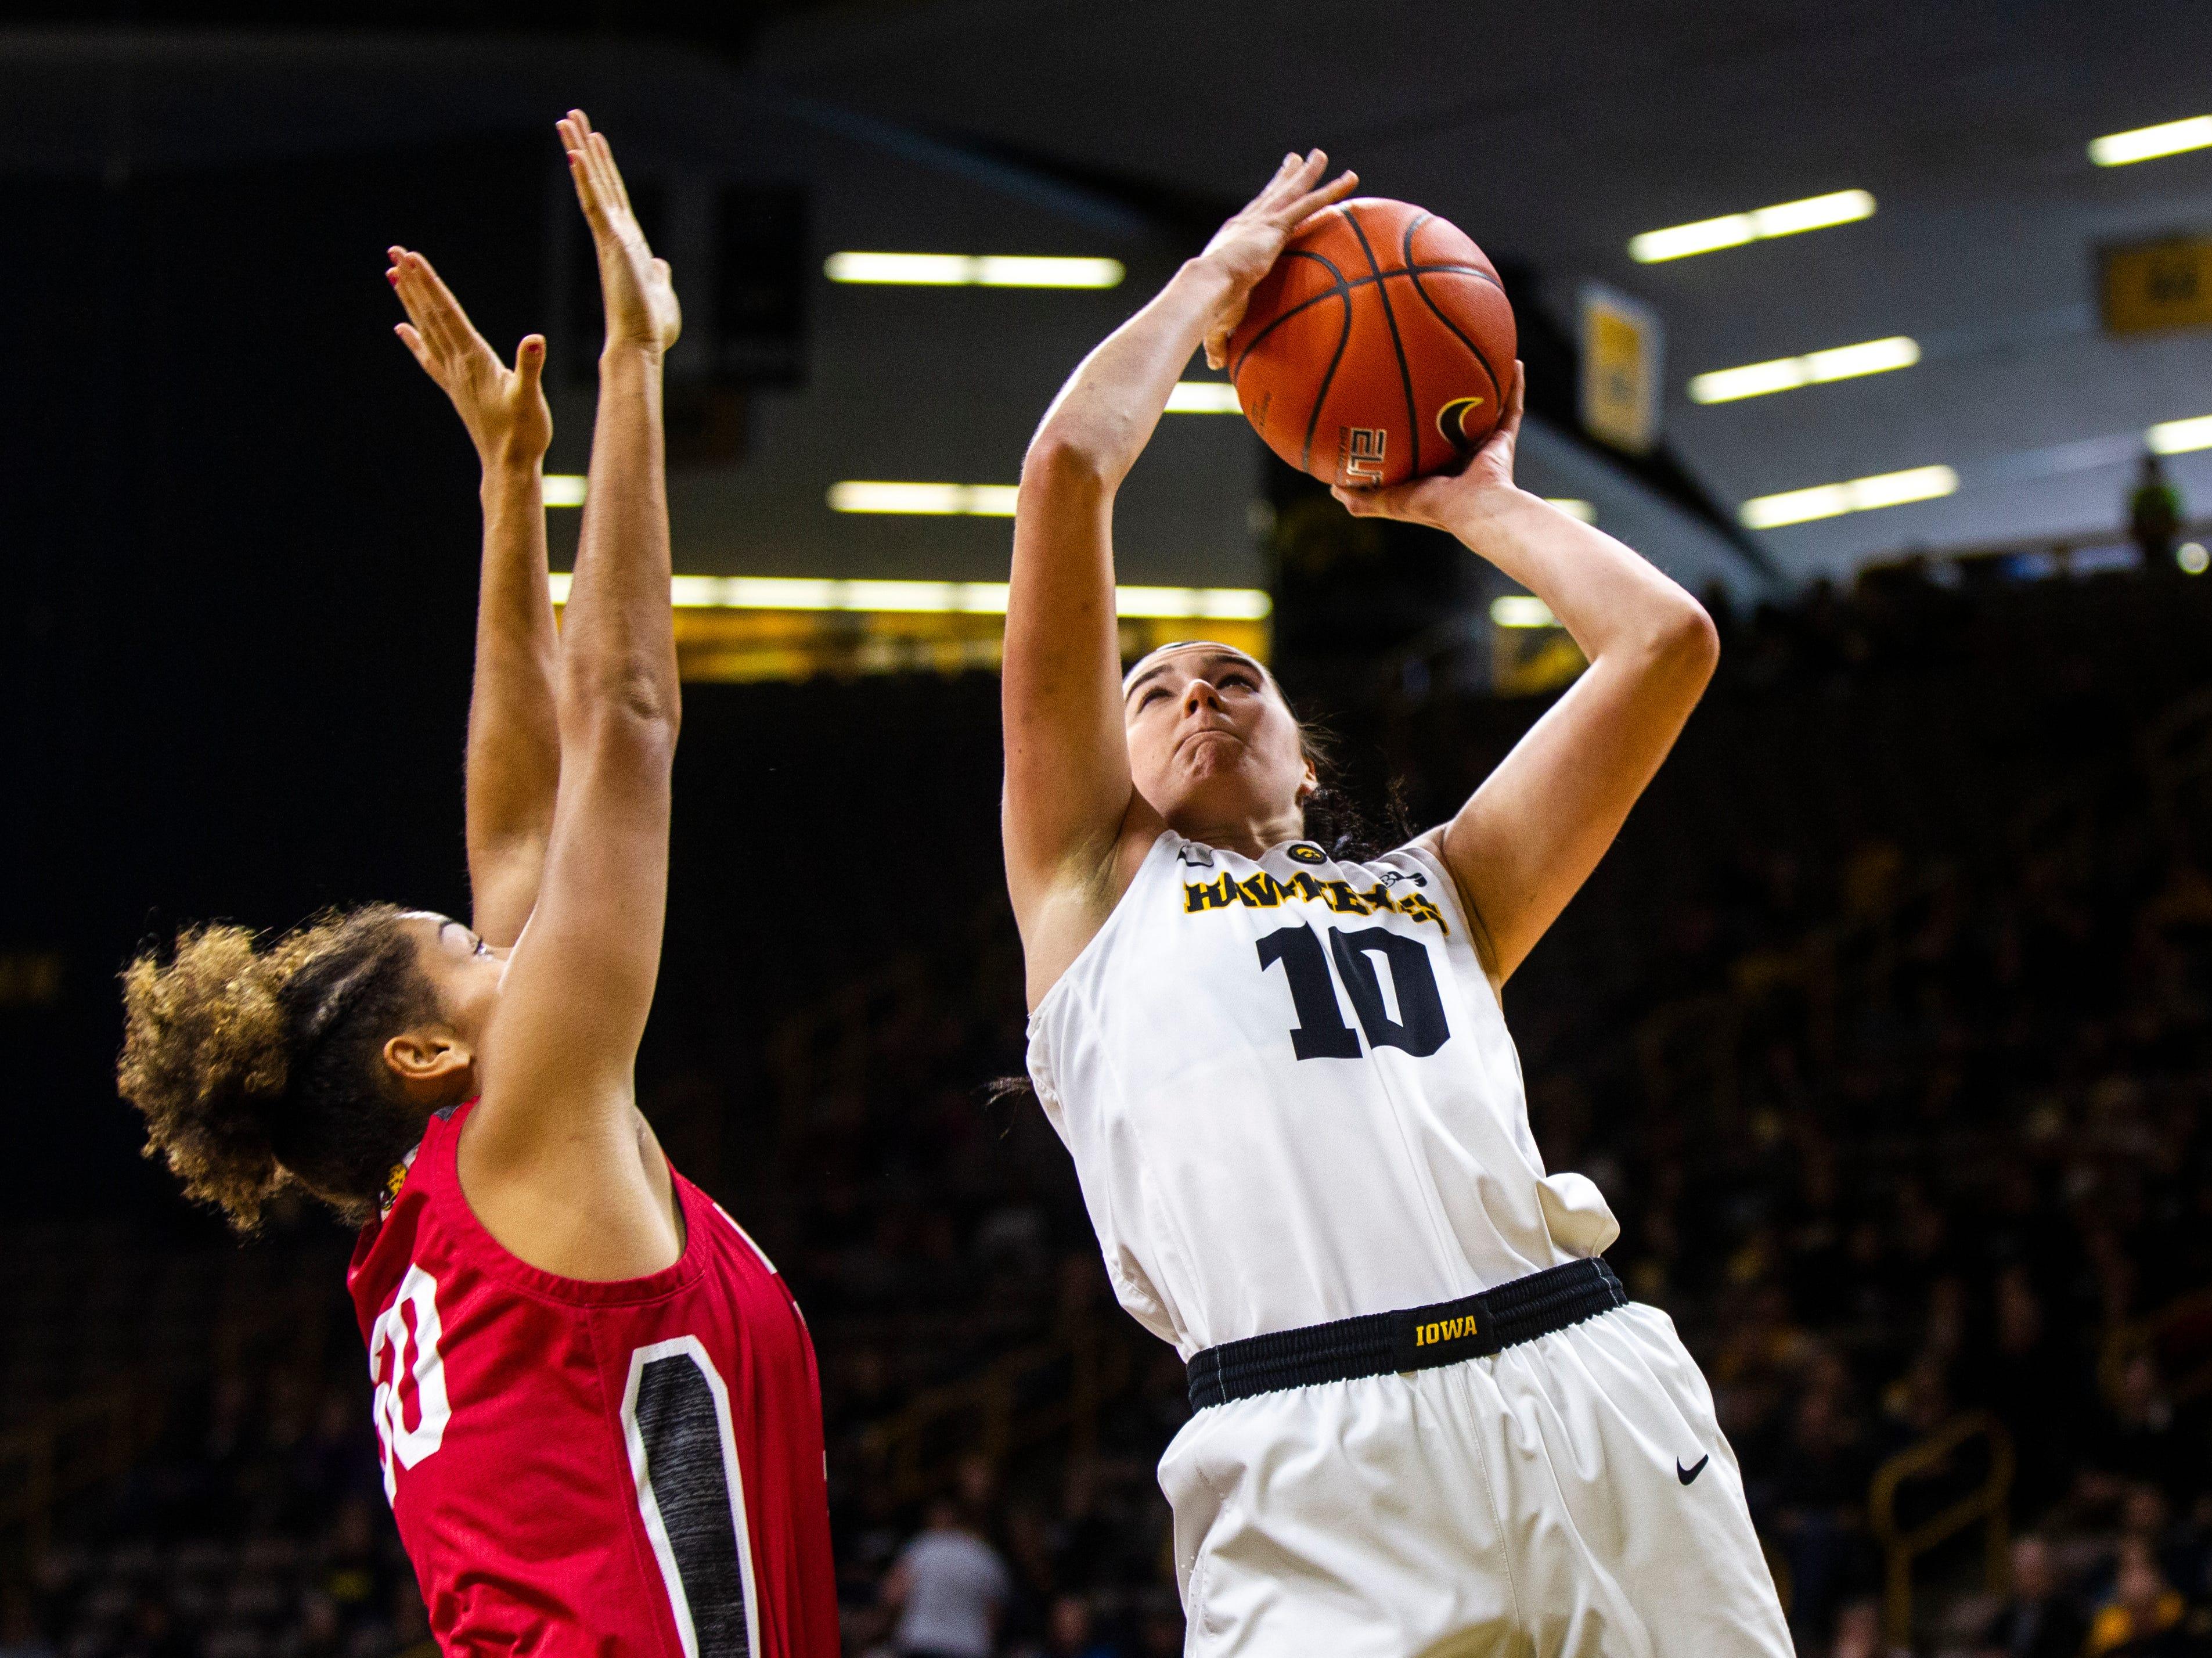 Iowa women's basketball: Megan Gustafson, No. 16 Hawkeyes grind past IUPUI